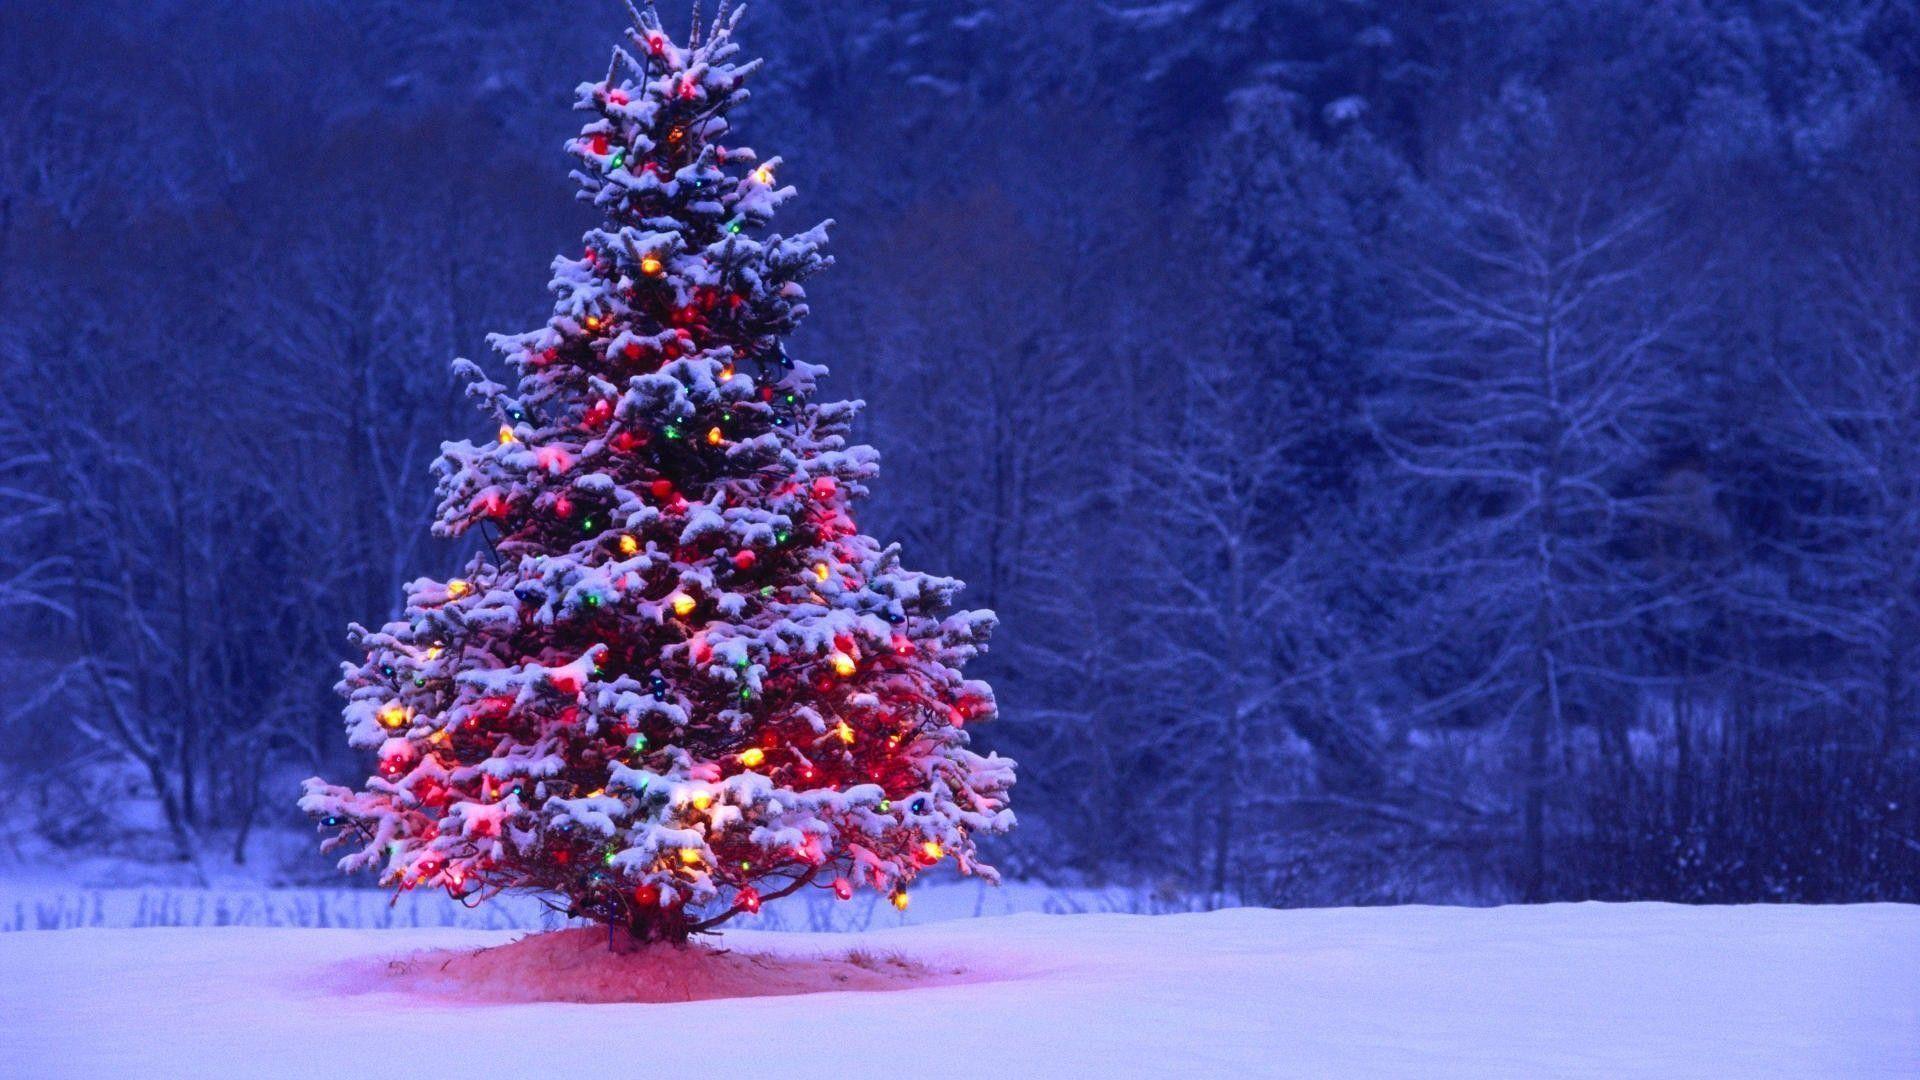 Wallpapers For > Winter Christmas Tree Desktop Backgrounds